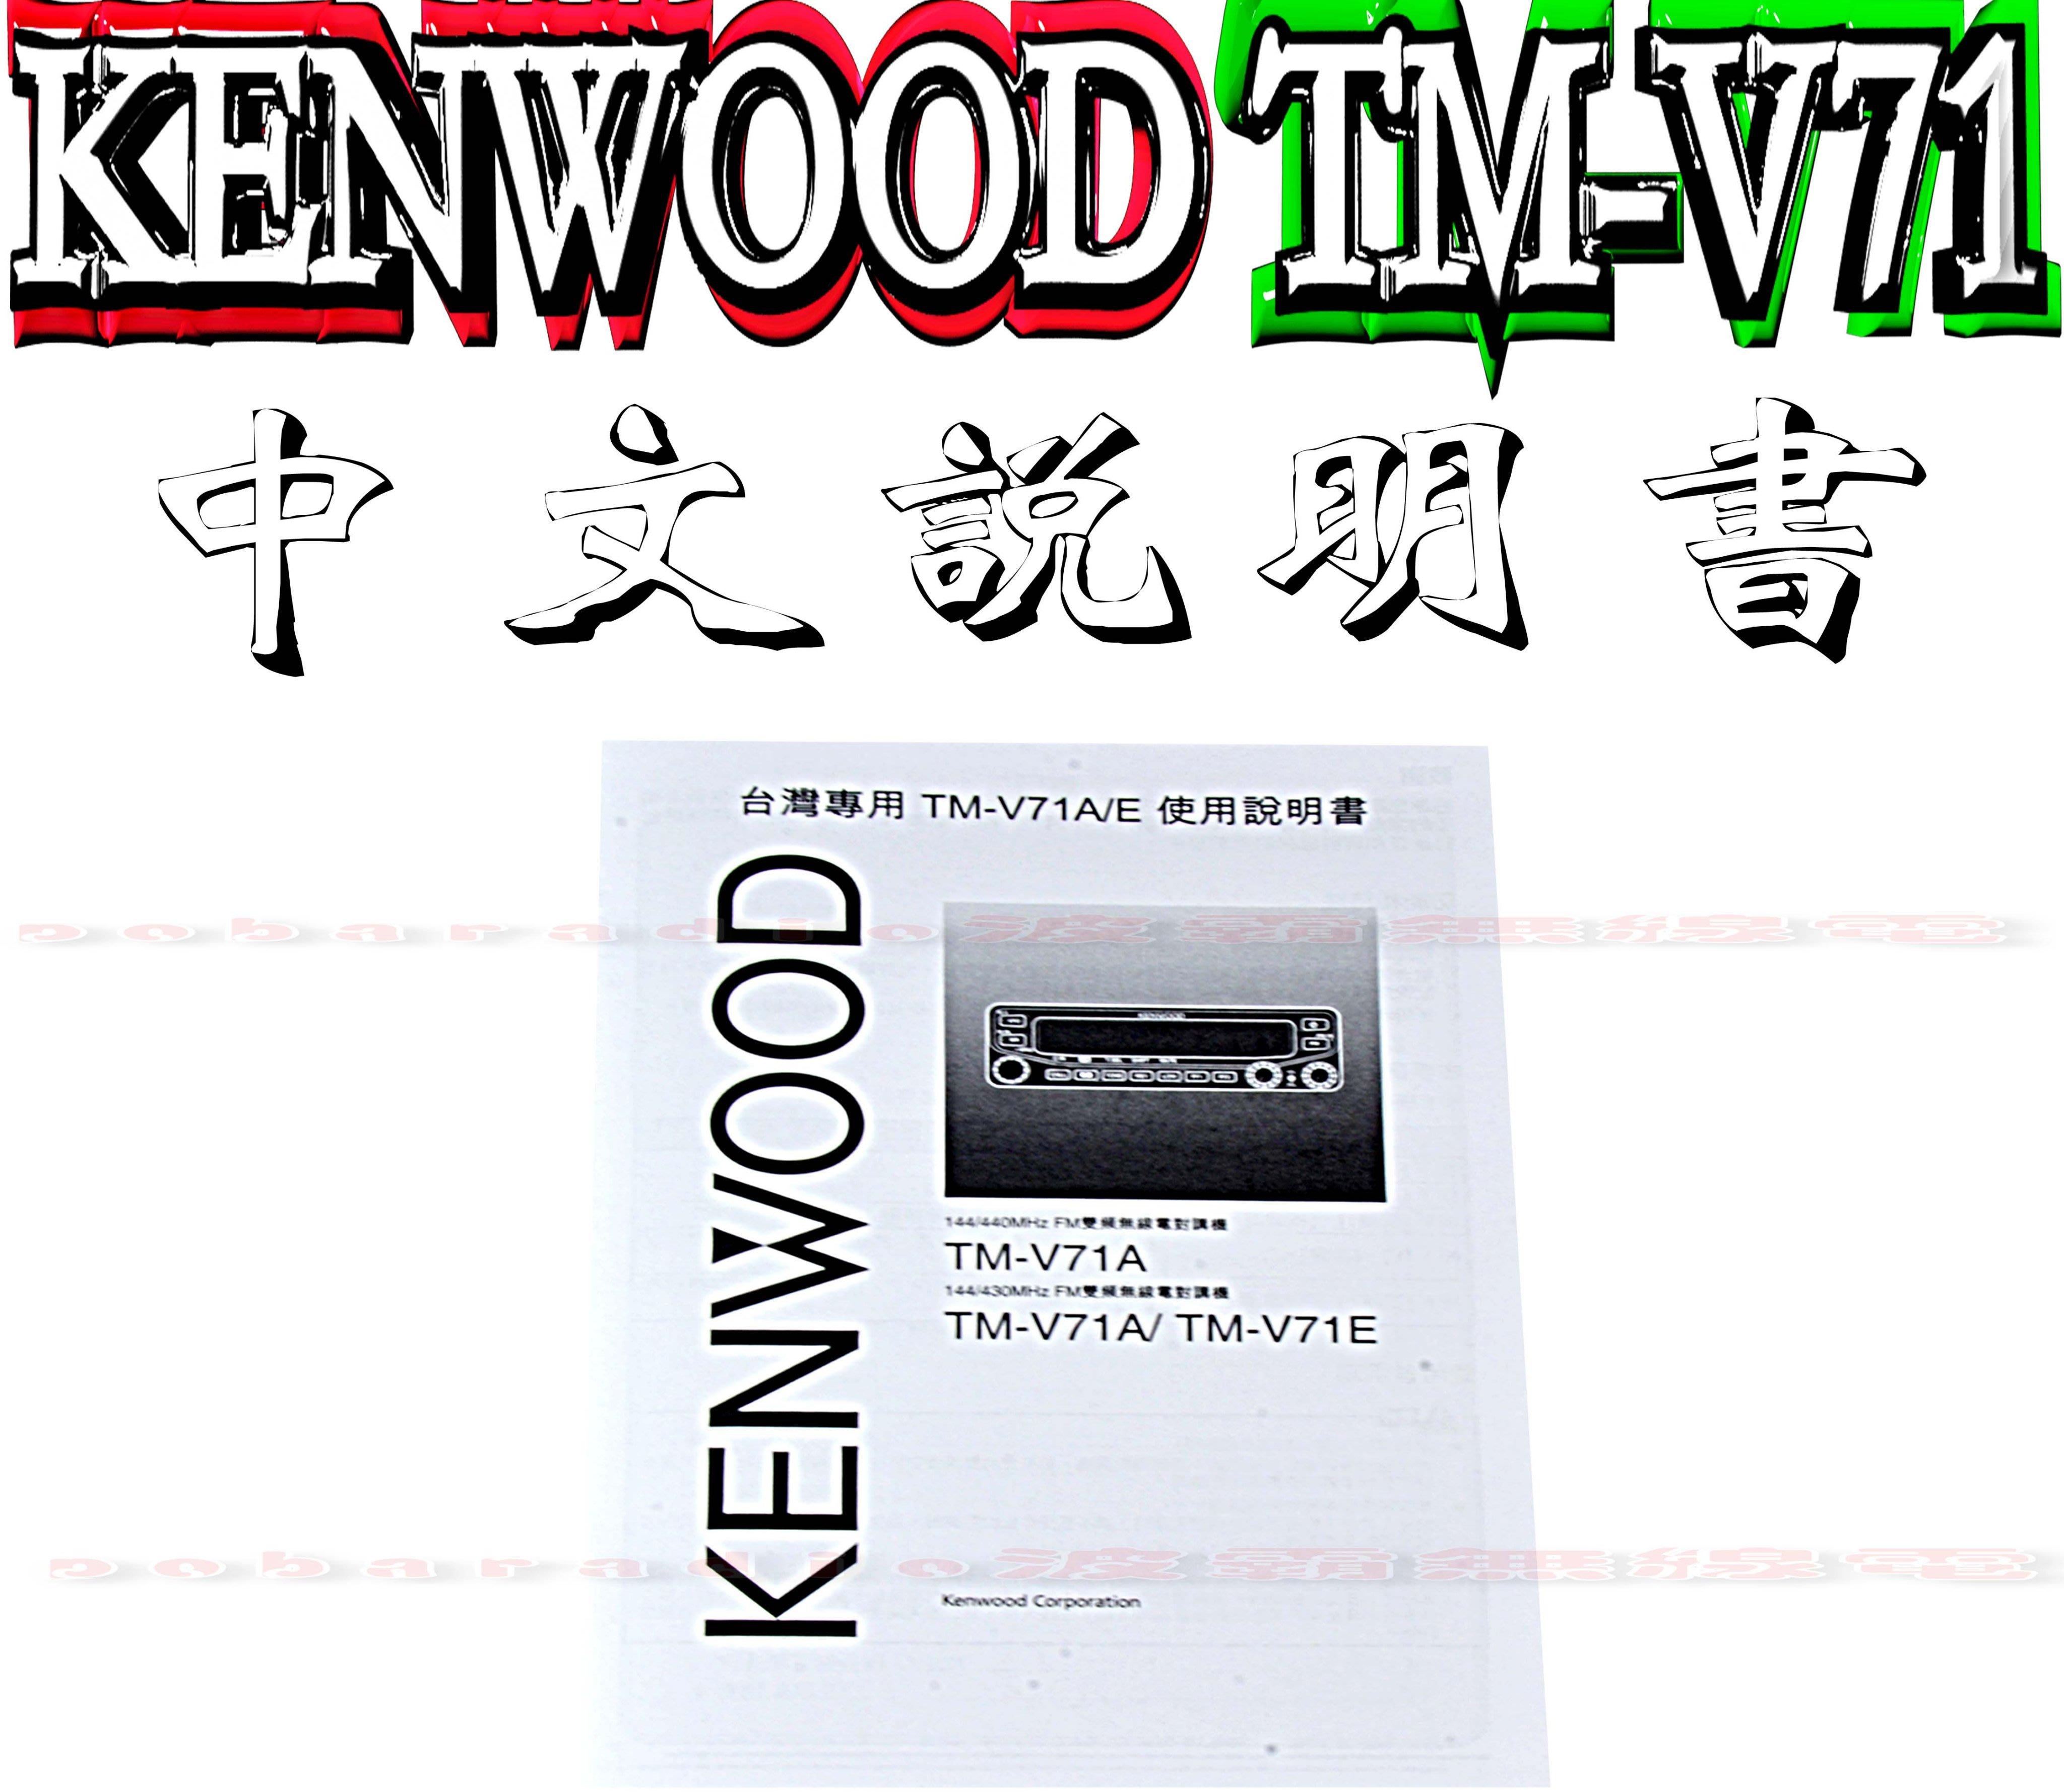 ☆波霸無線電☆KENWOOD TM-V71A說明書 TM-V71說明書TM-V71E說明書TMV71說明書 操作說明書